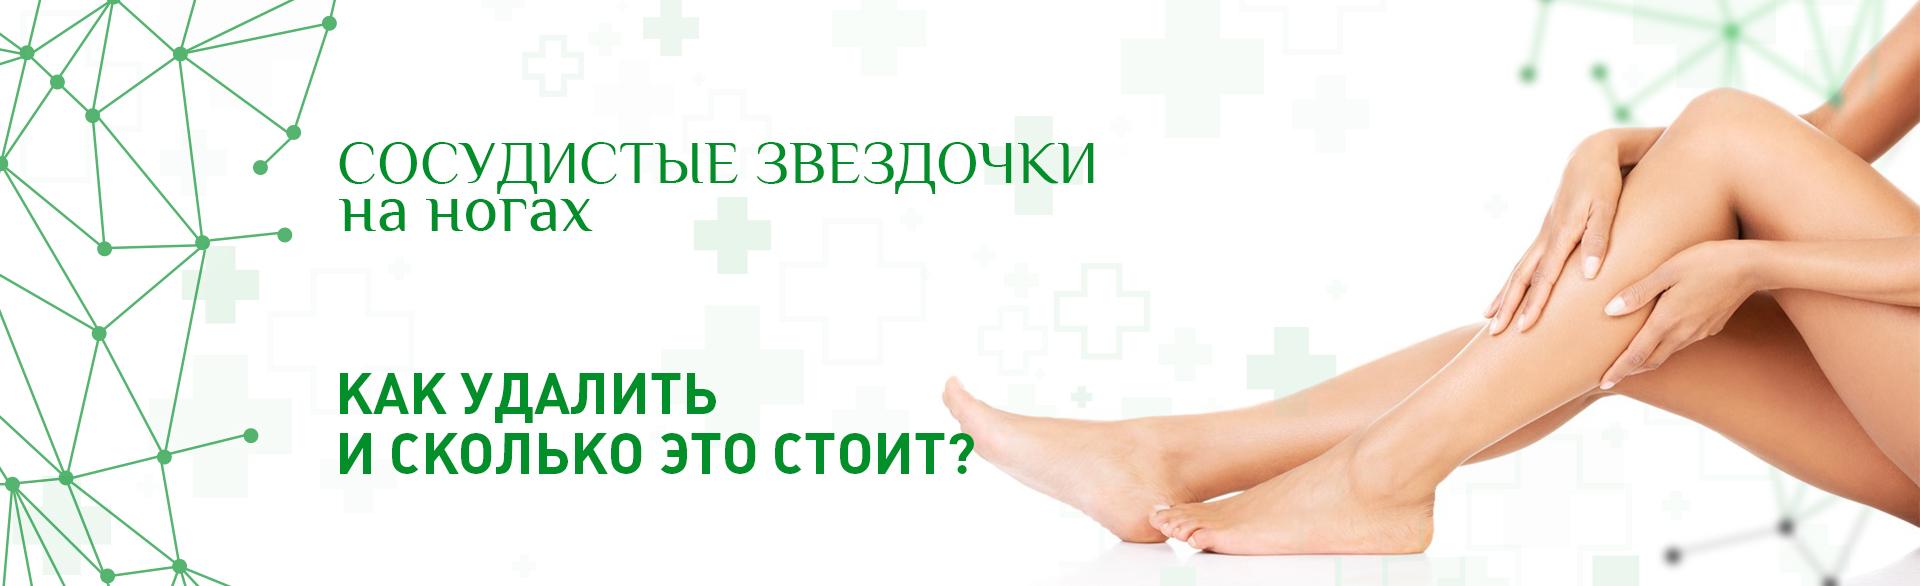 http://zdorovie-plus.com/services/zdorove-vsei-semi/flebologiia/udalenie-sosudistyh-zvezdochek